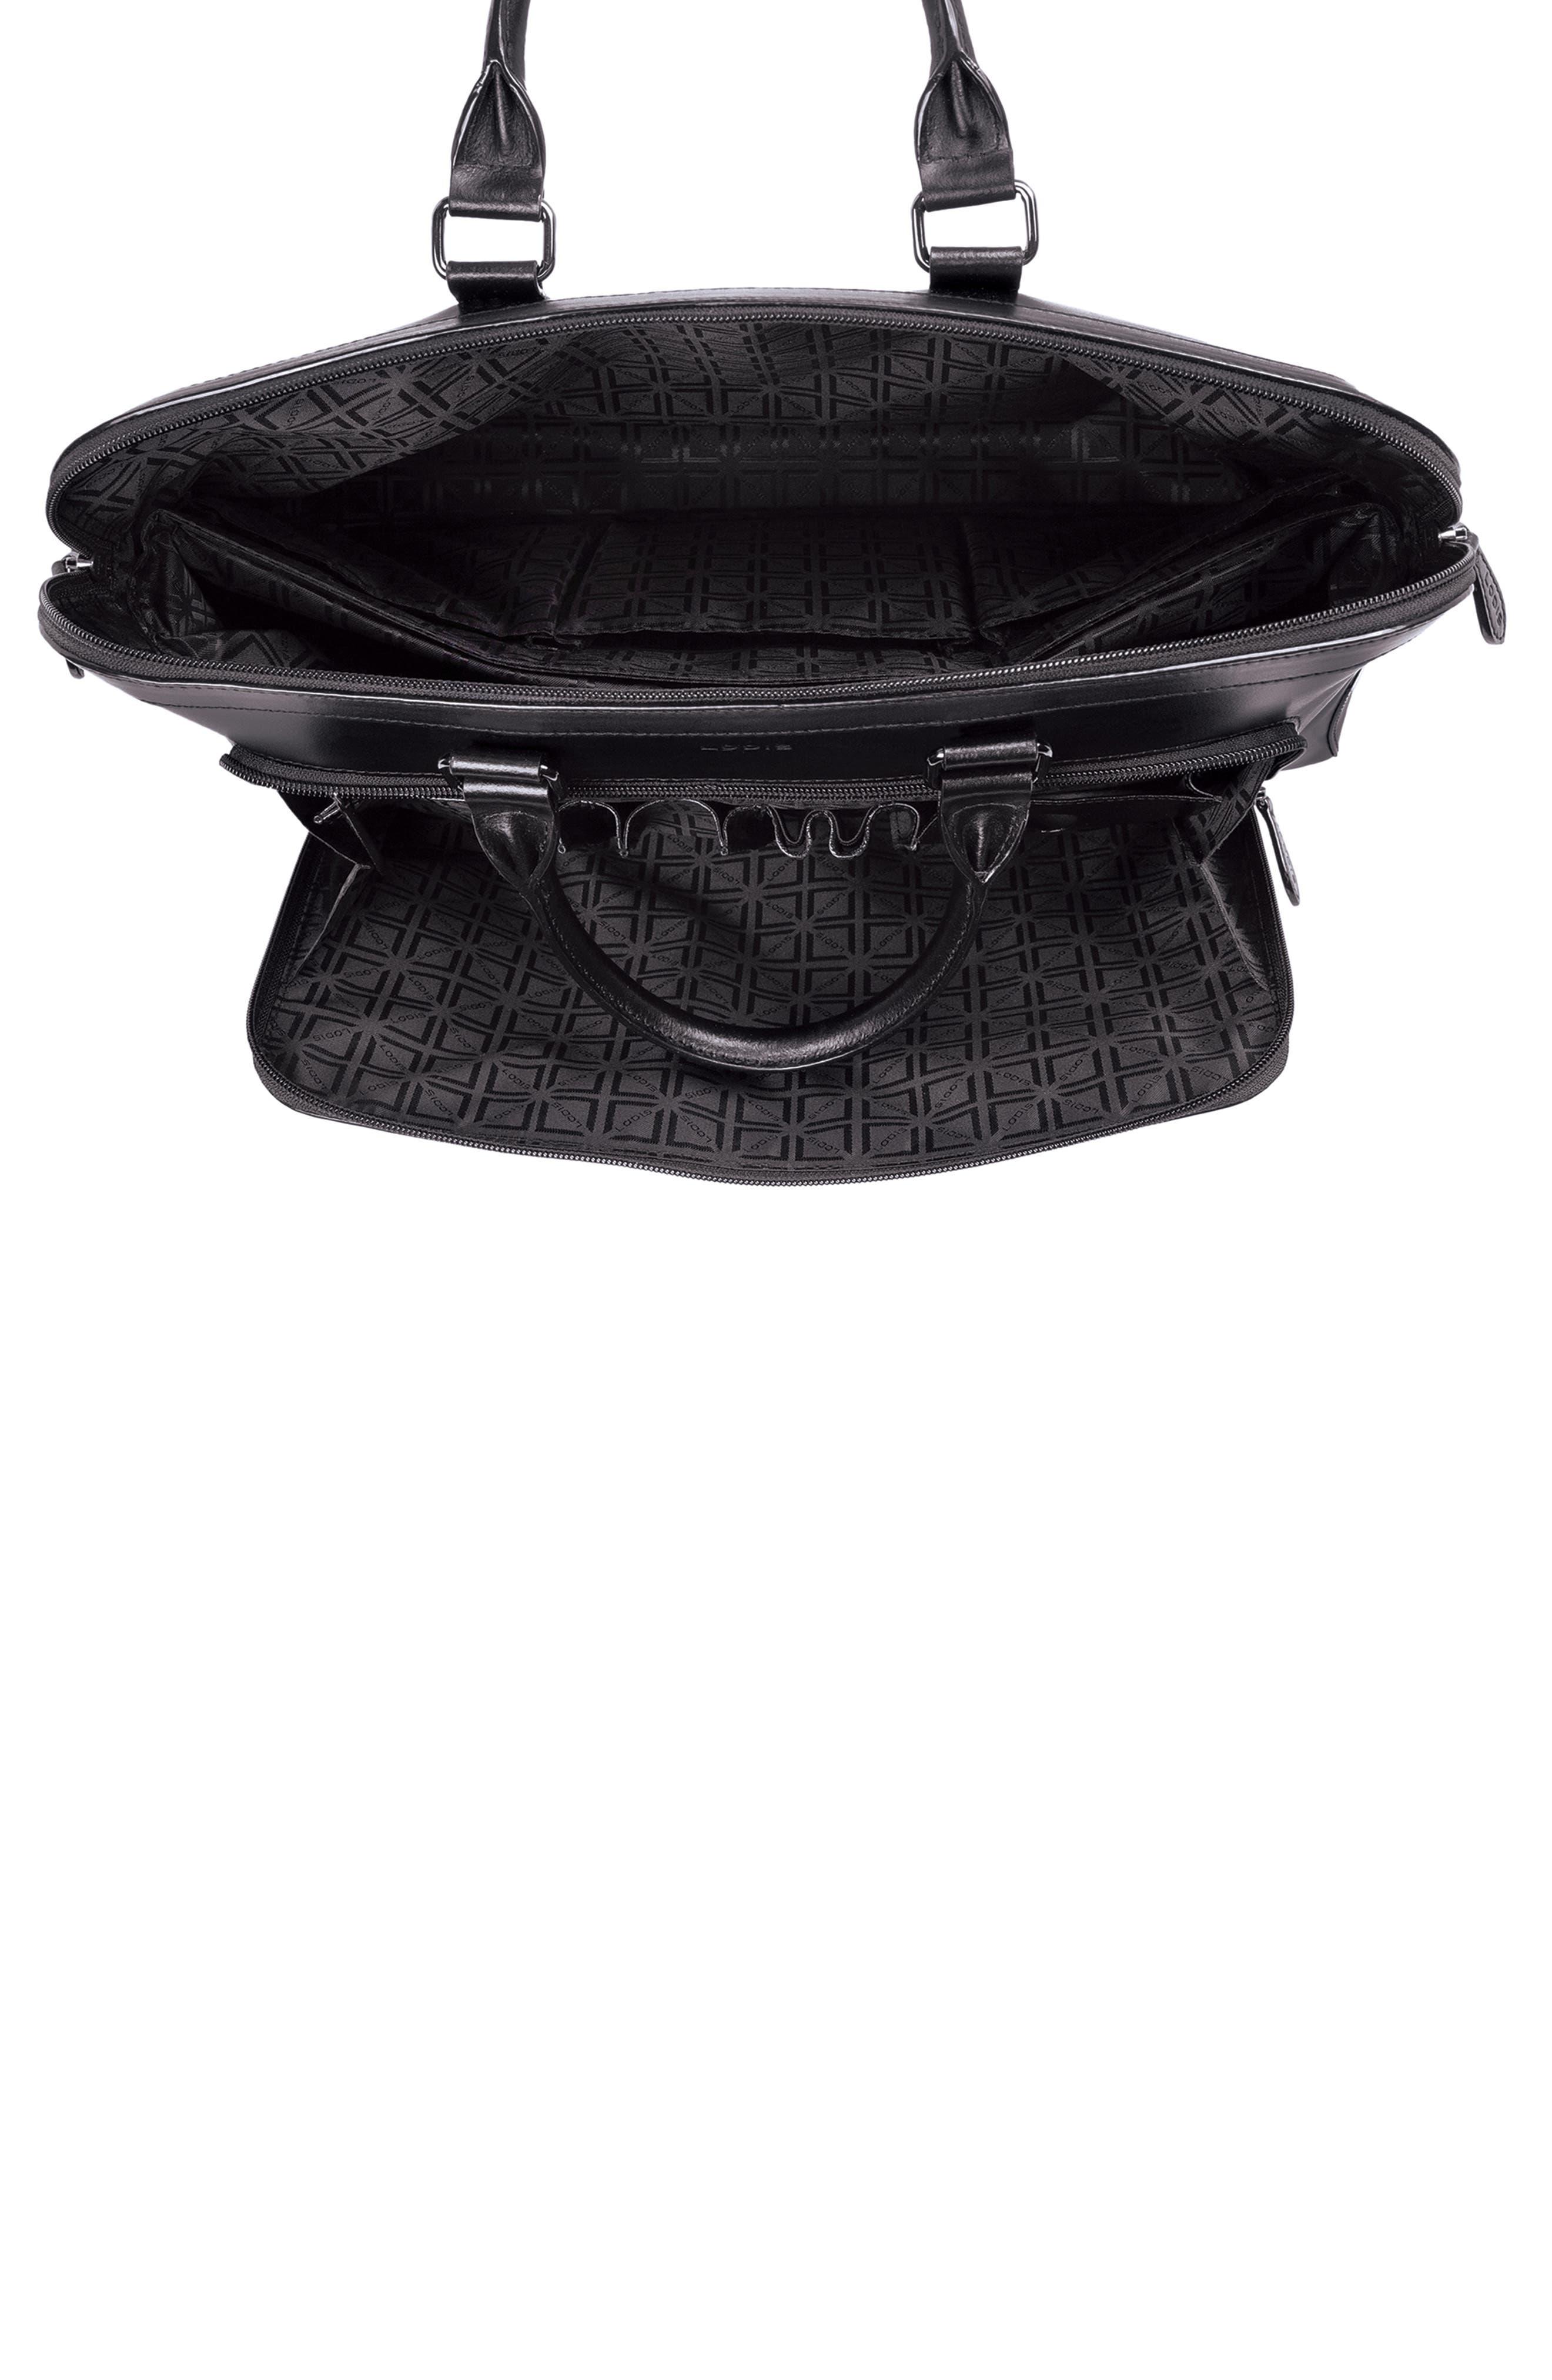 Audrey Under Lock & Key - Brera RFID Leather Briefcase,                             Alternate thumbnail 3, color,                             BLACK/ BLACK